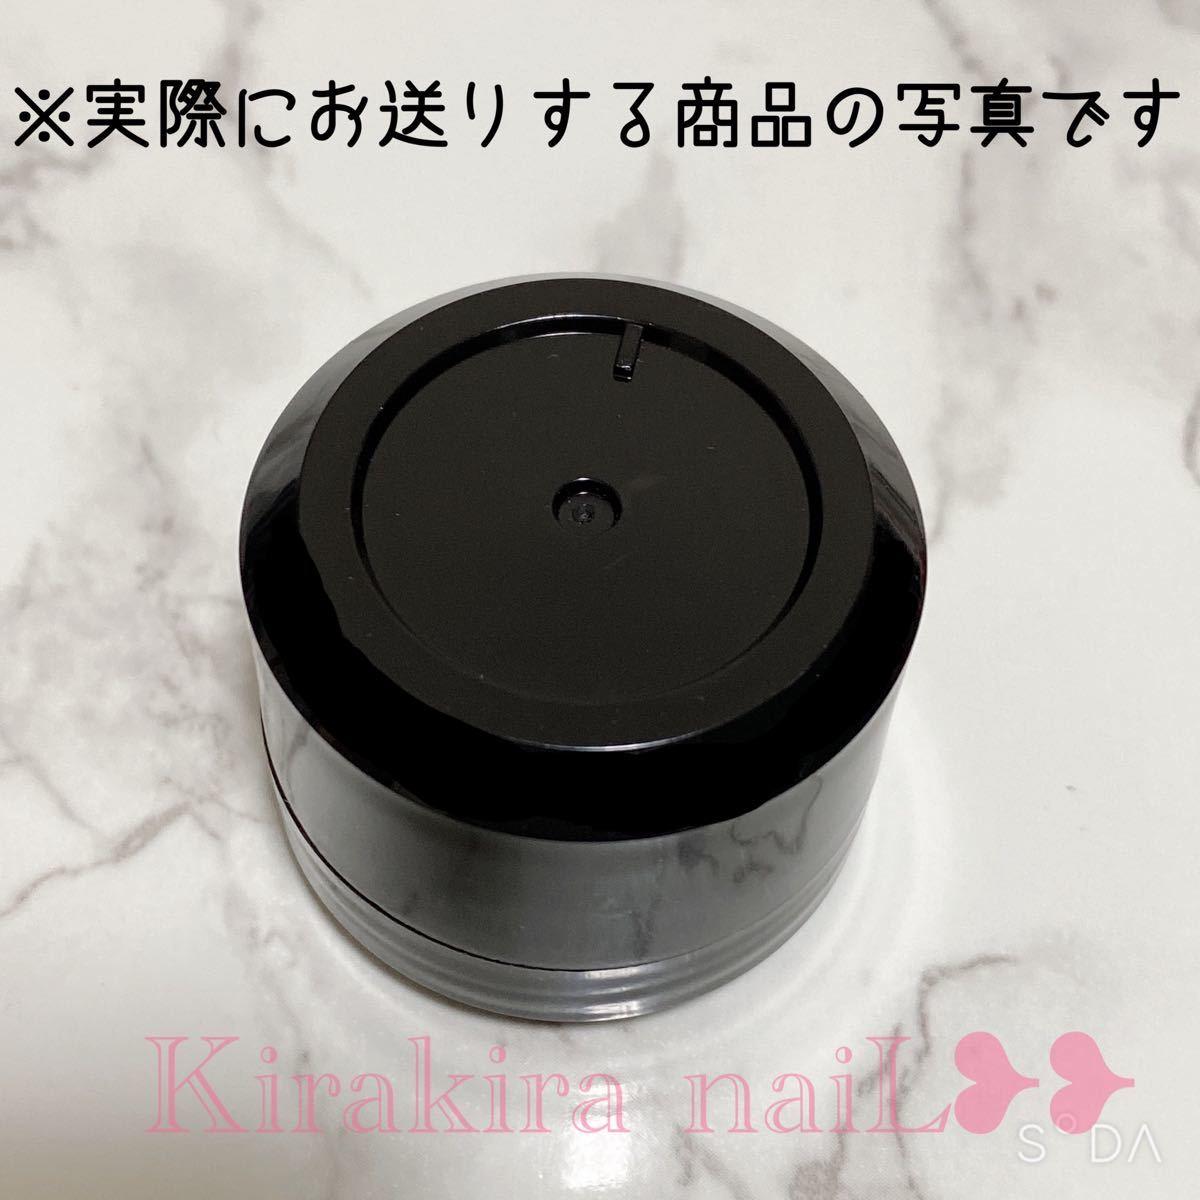 New★全12種☆Venalisa☆グリッタージェル☆カラーラメジェル P51